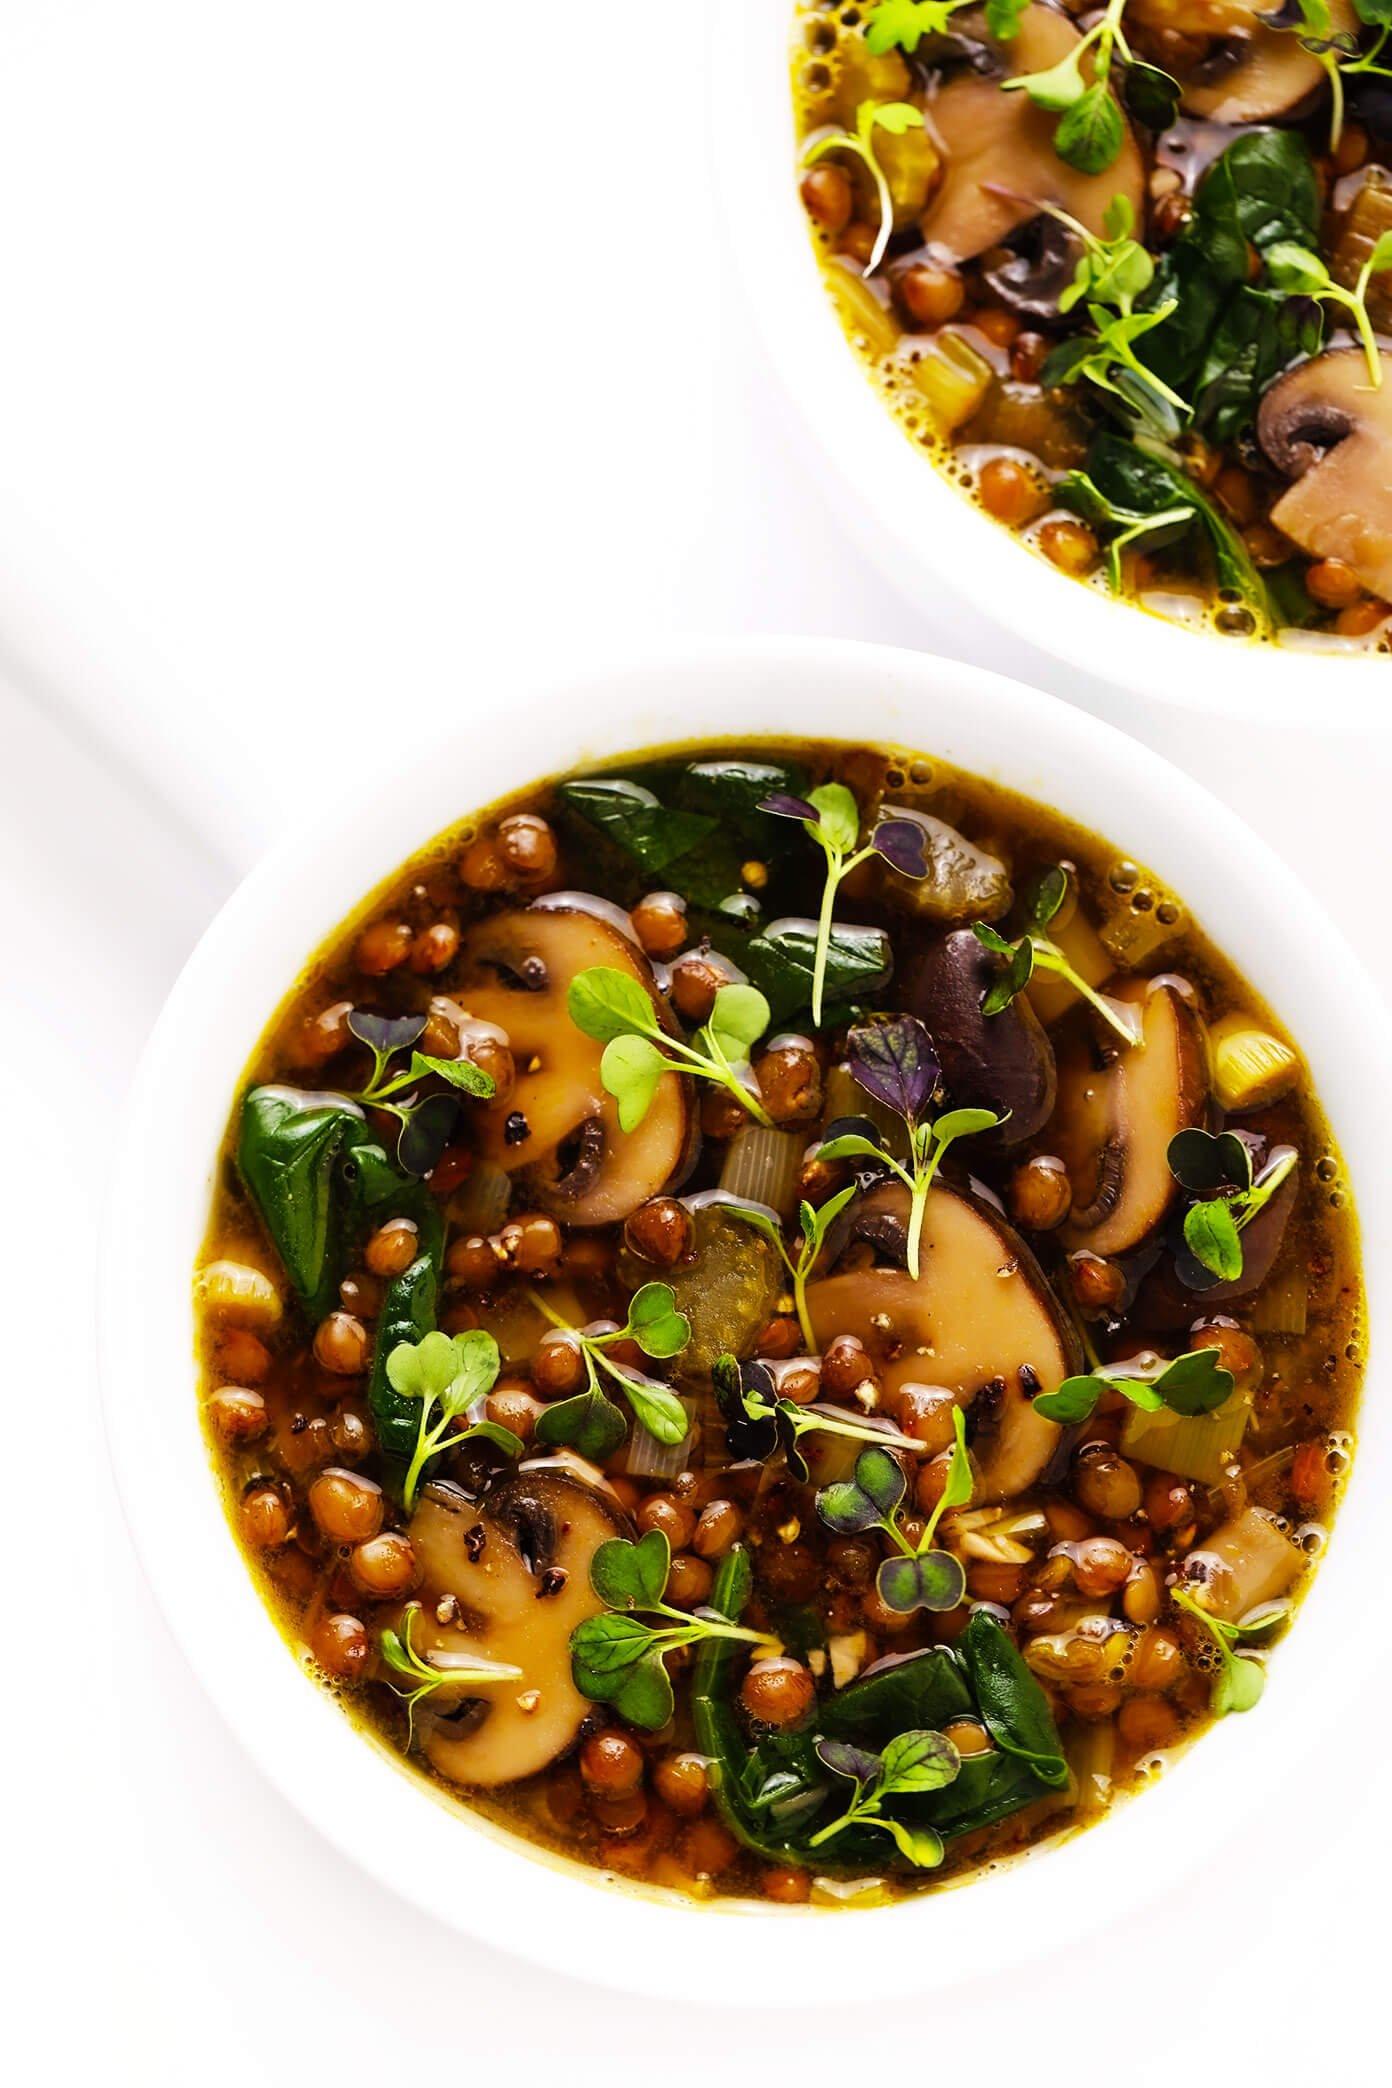 Receita de sopa de lentilha e cogumelos francesa em tigelas